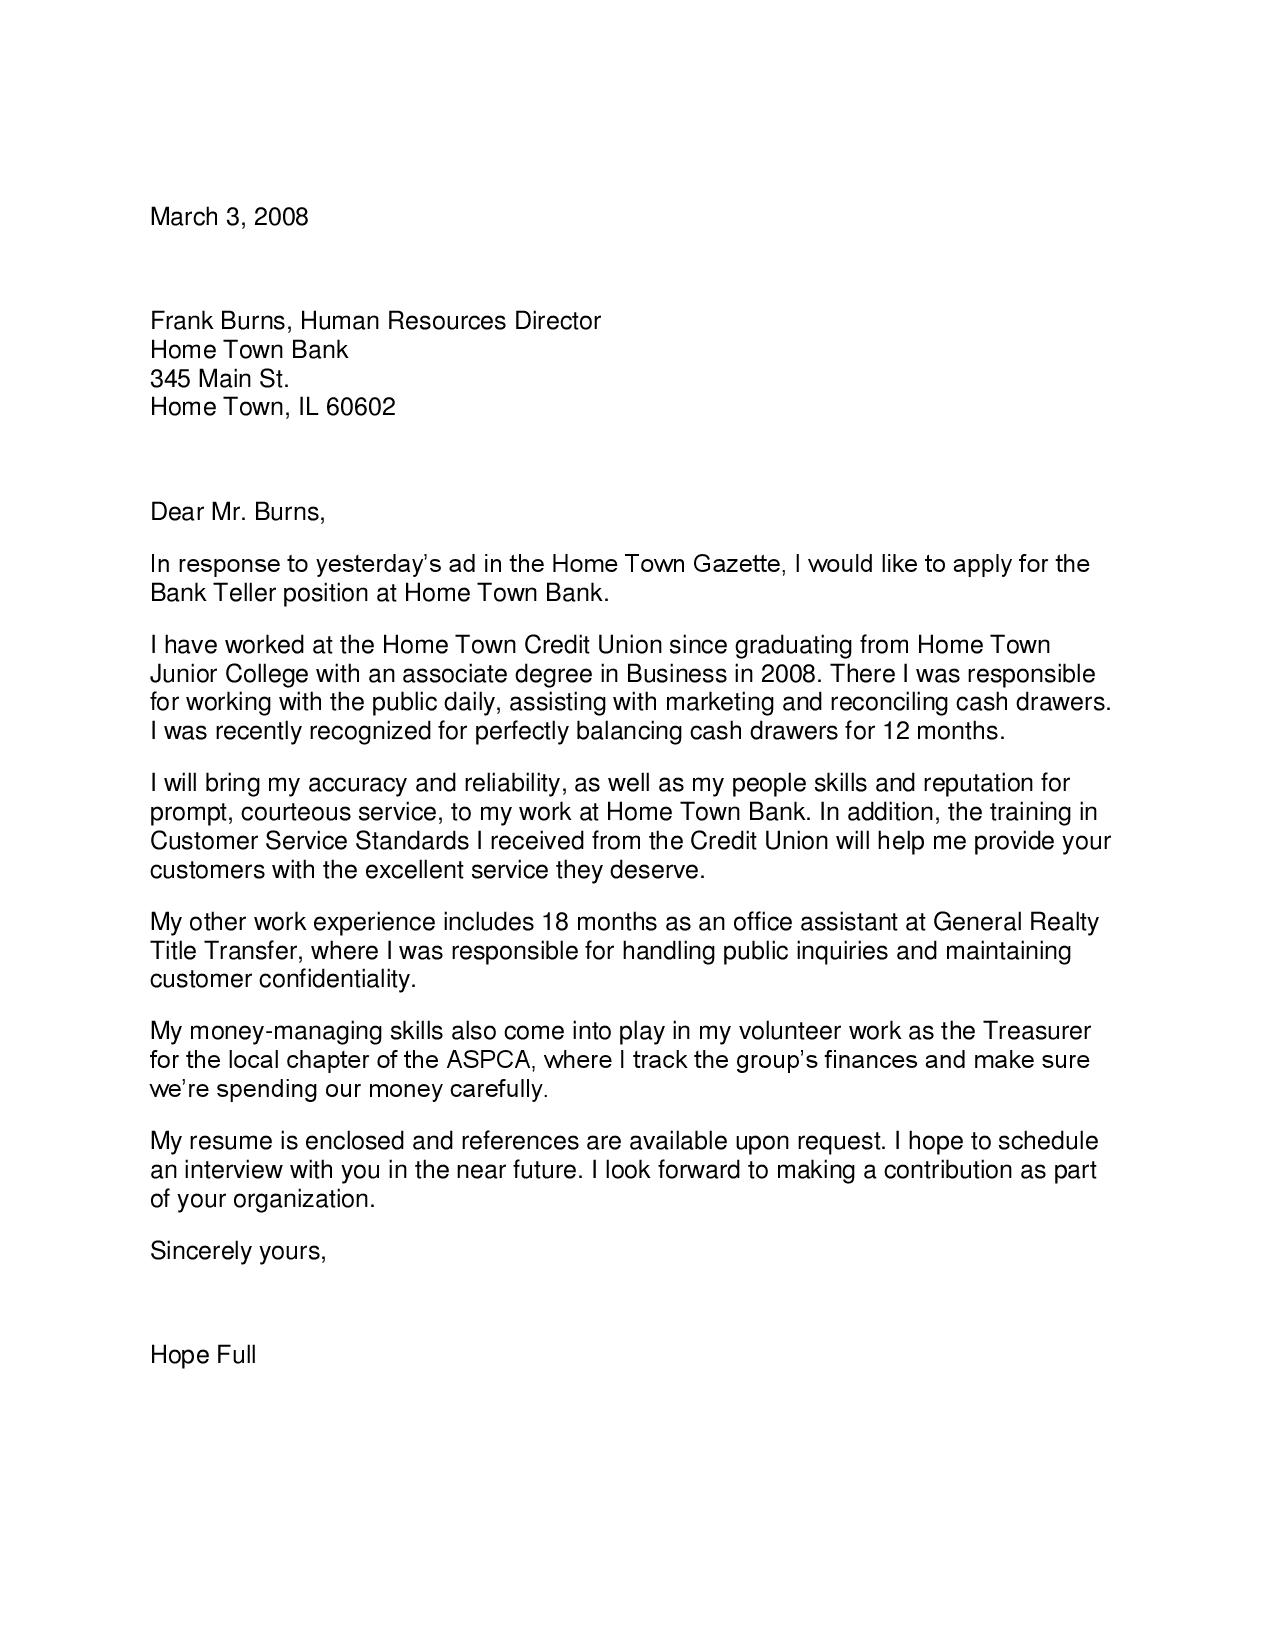 100 hr consultant cover letter sle cover letter